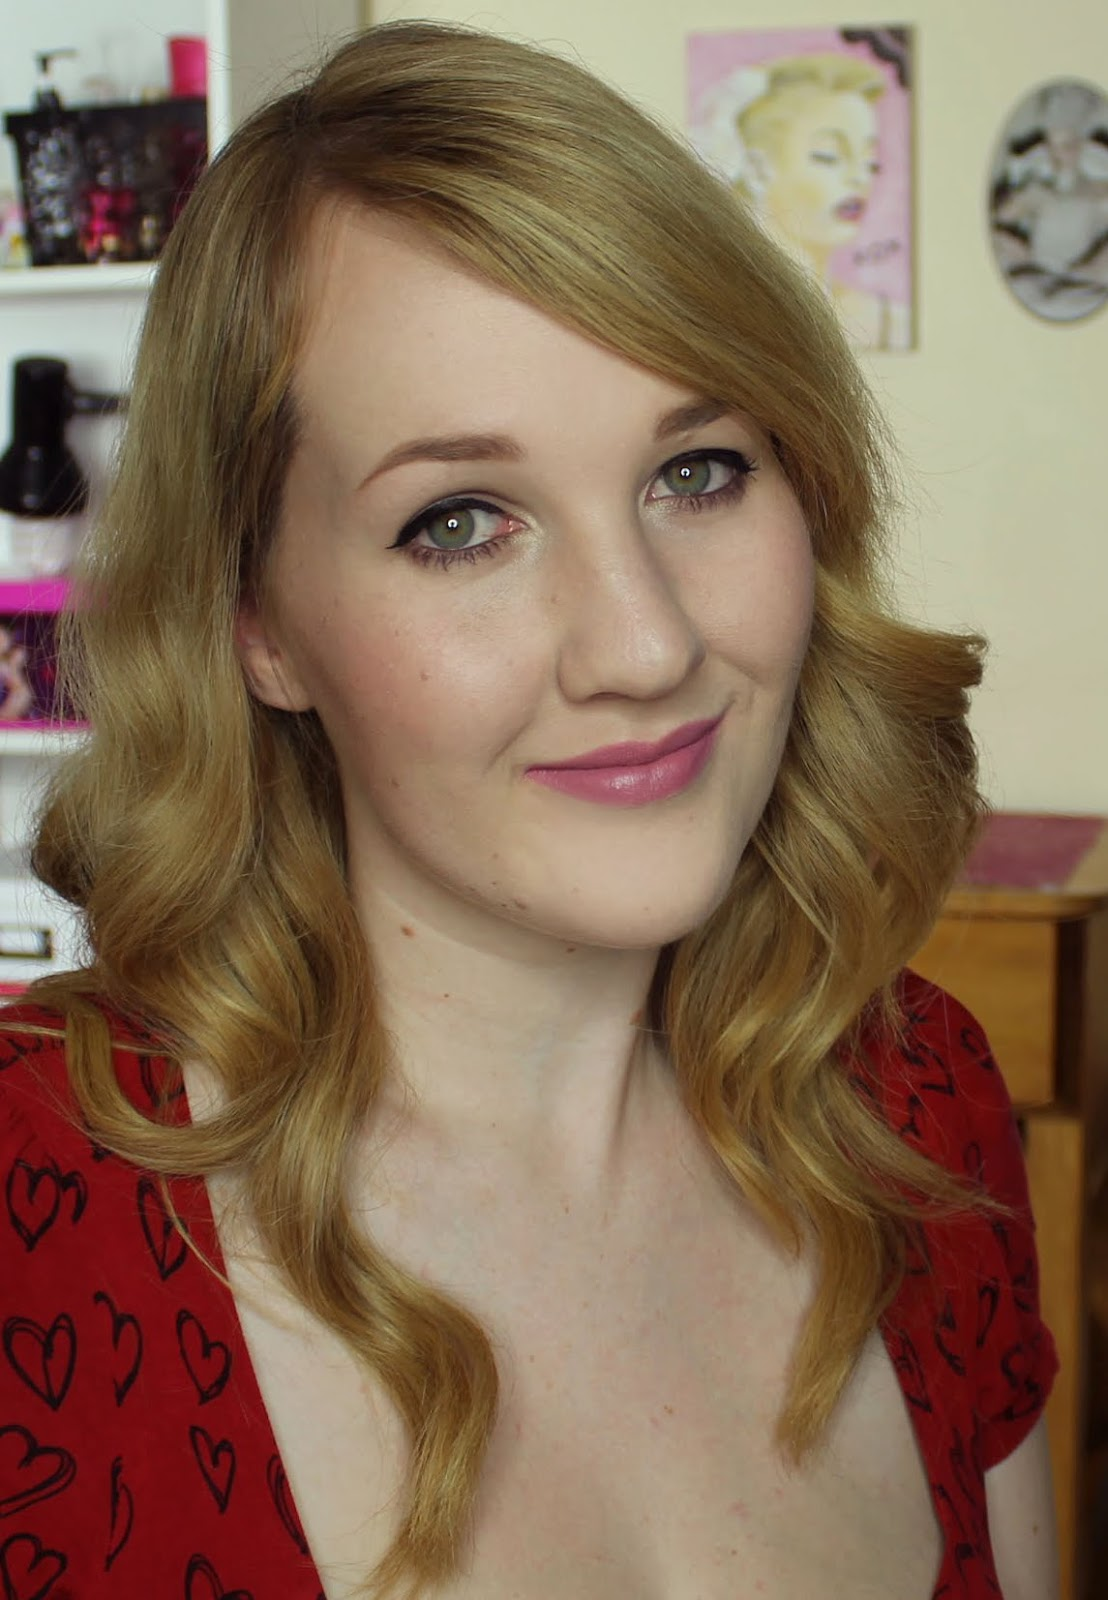 Jordana Lipsticks - Matte Lavender Lady Swatches & Review